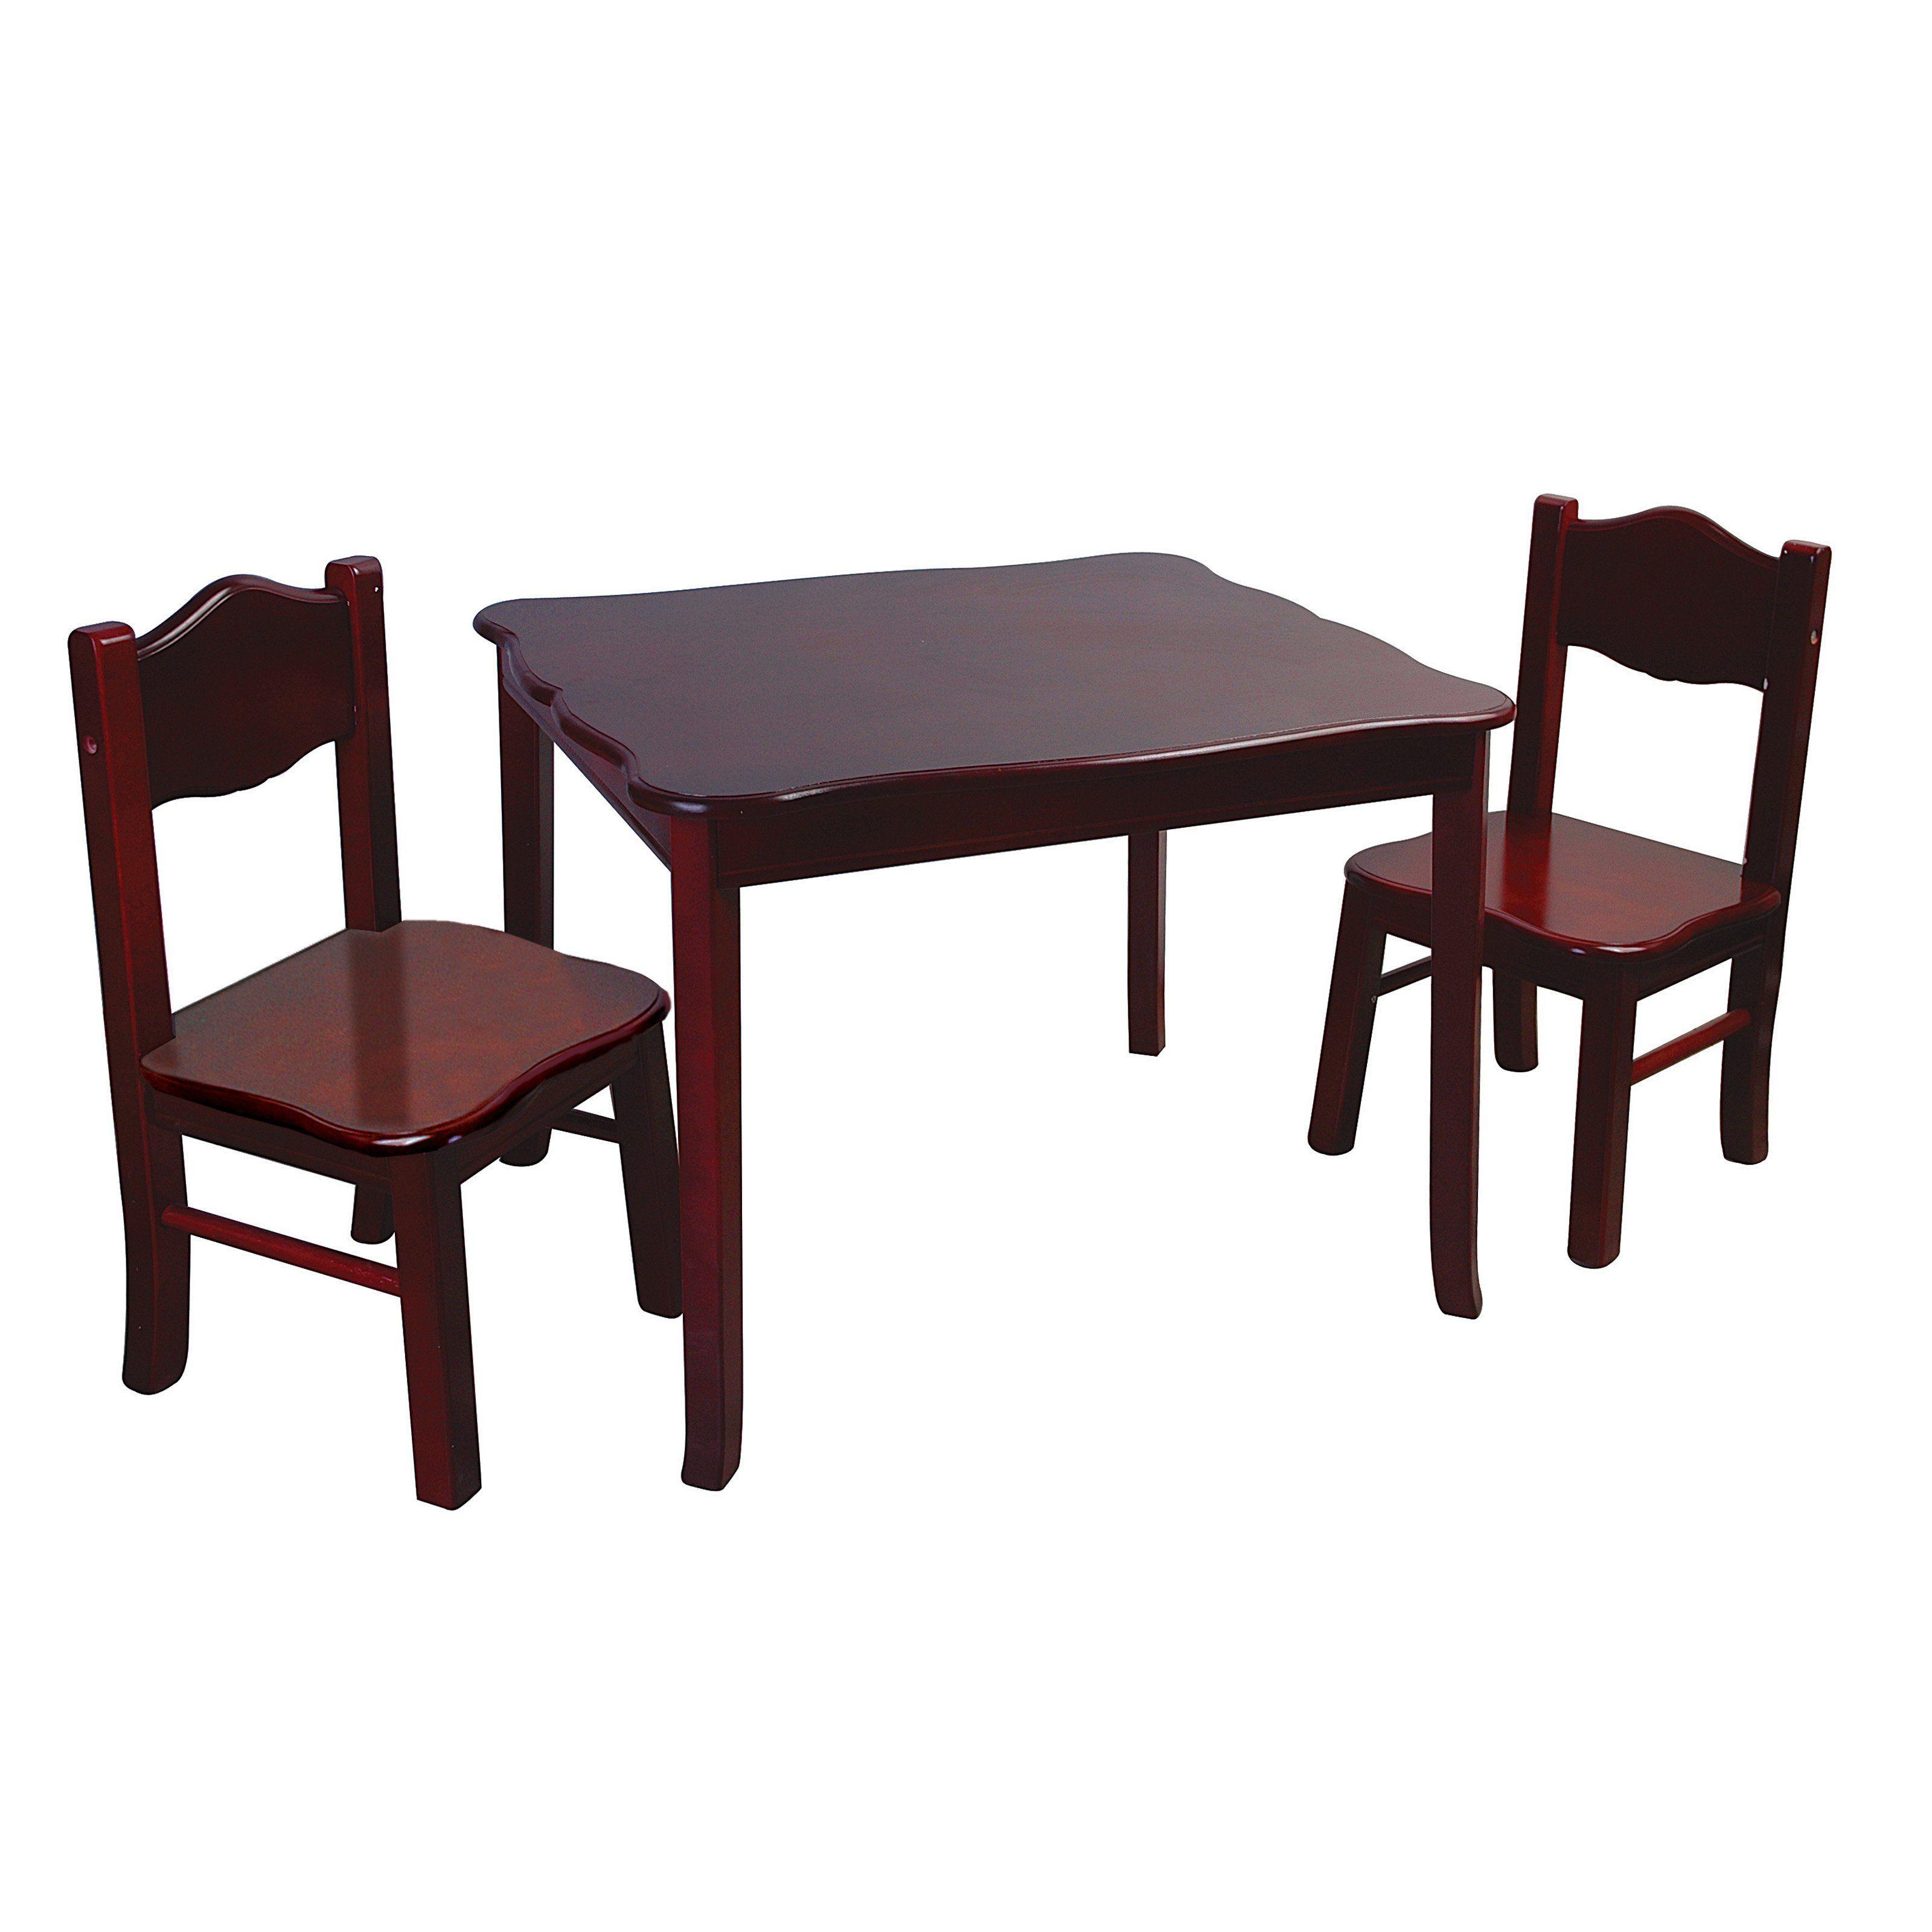 Guidecraft Classic Espresso Table & Chair Set www